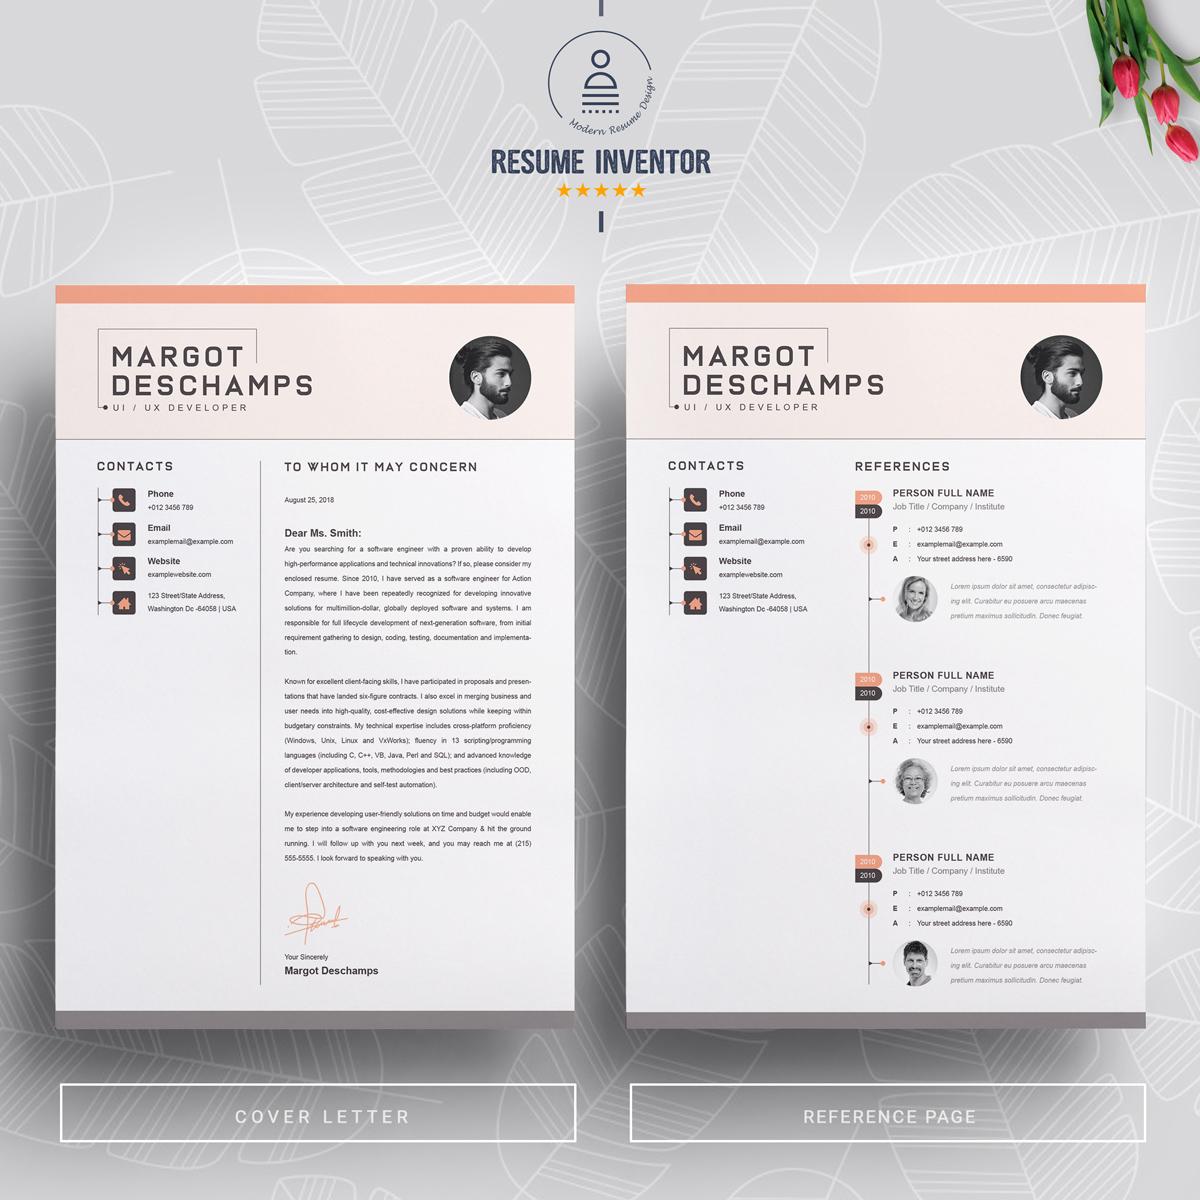 https://s3u.tmimgcdn.com/1860567-1580631056672_03_2-Pages-Free-Resume-Design-Template.jpg